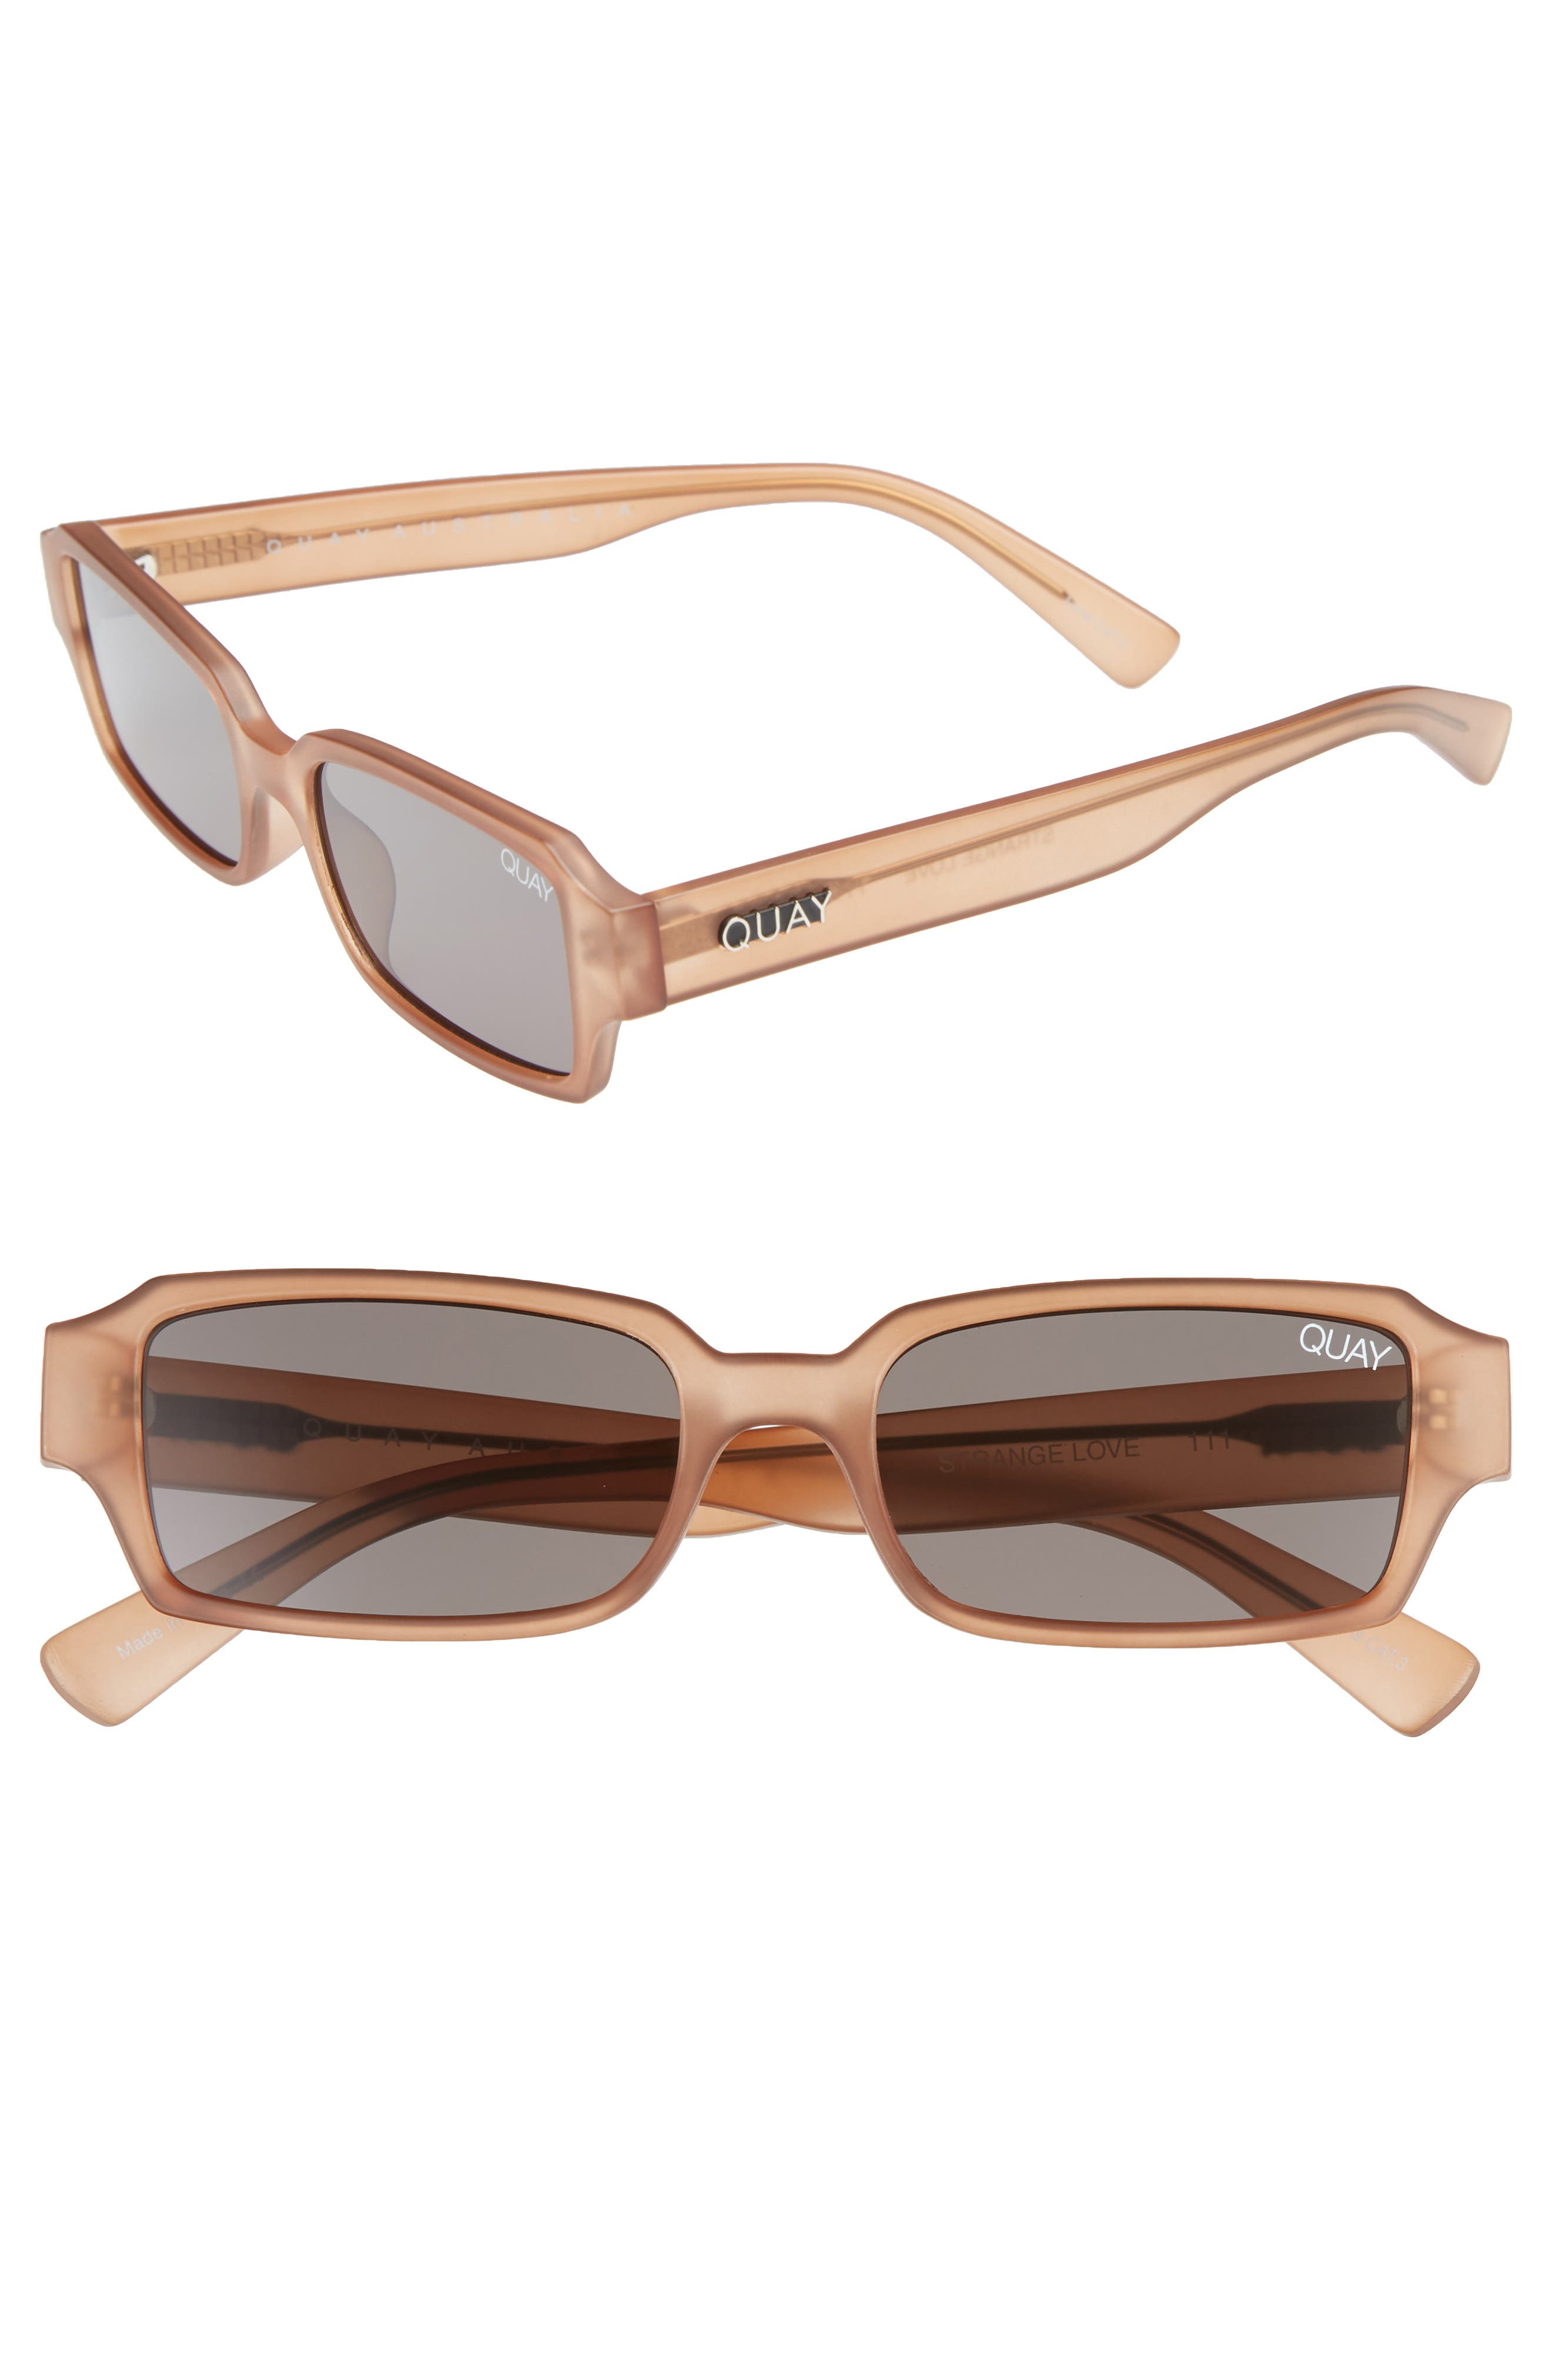 Quay Australia Strange Love 5m Rectangle Sunglasses - Brown/ Smoke